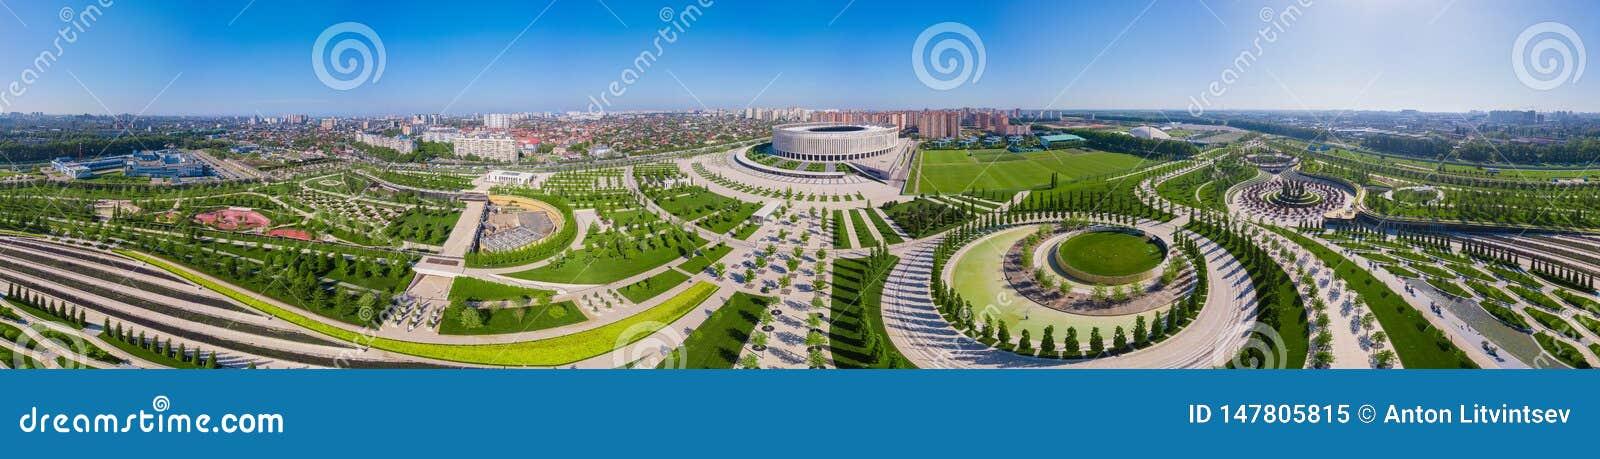 Krasnodar, Russie - mai 2019 : Vue panoramique large de stade de Krasnodar et du parc de Galitsky